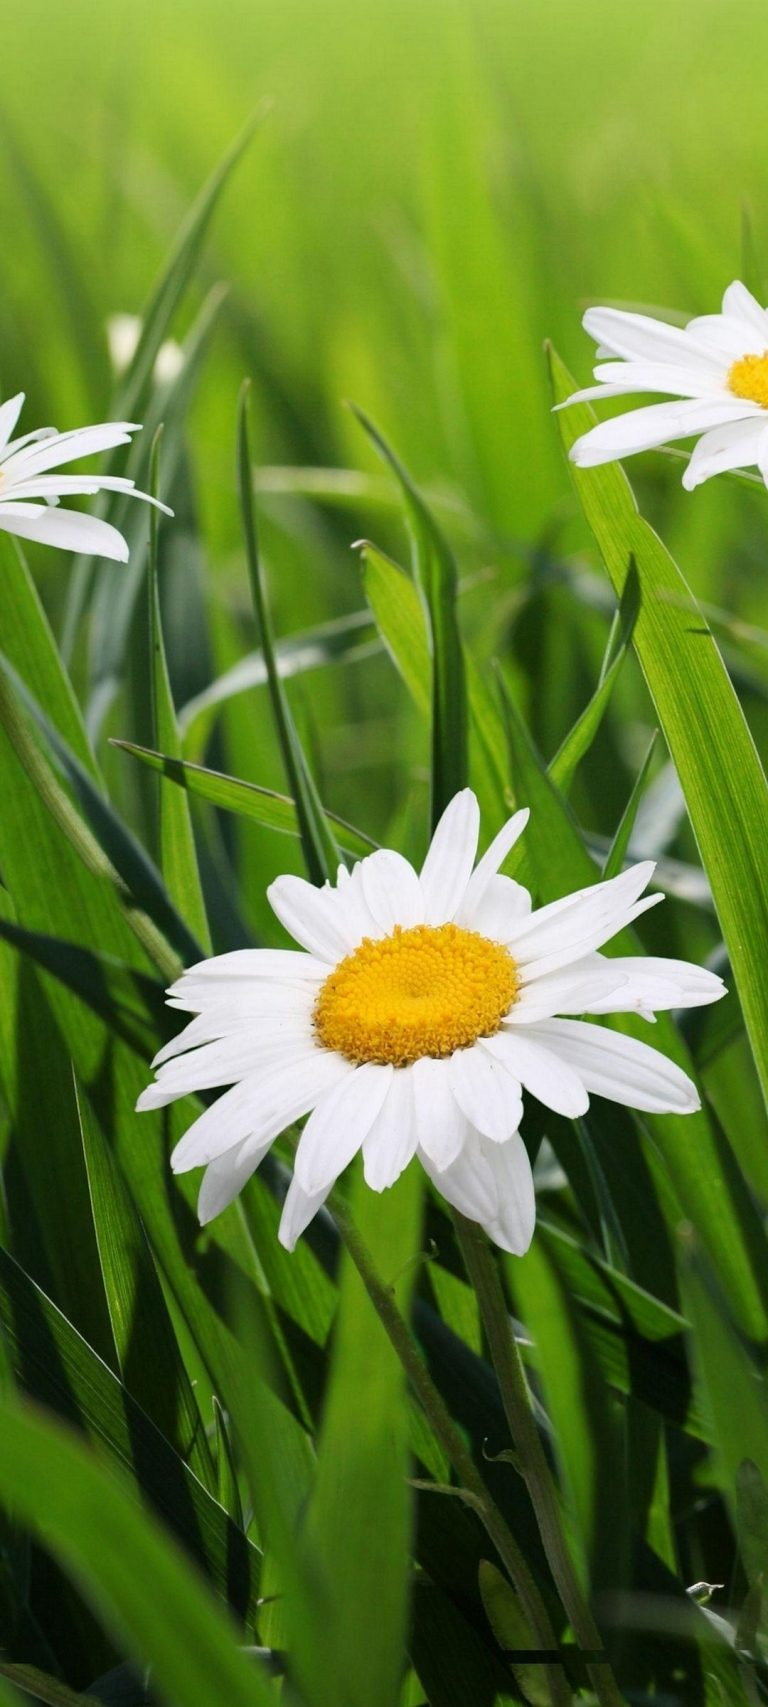 Daisies Flowers Grass Green Blur 1080x2400 768x1707